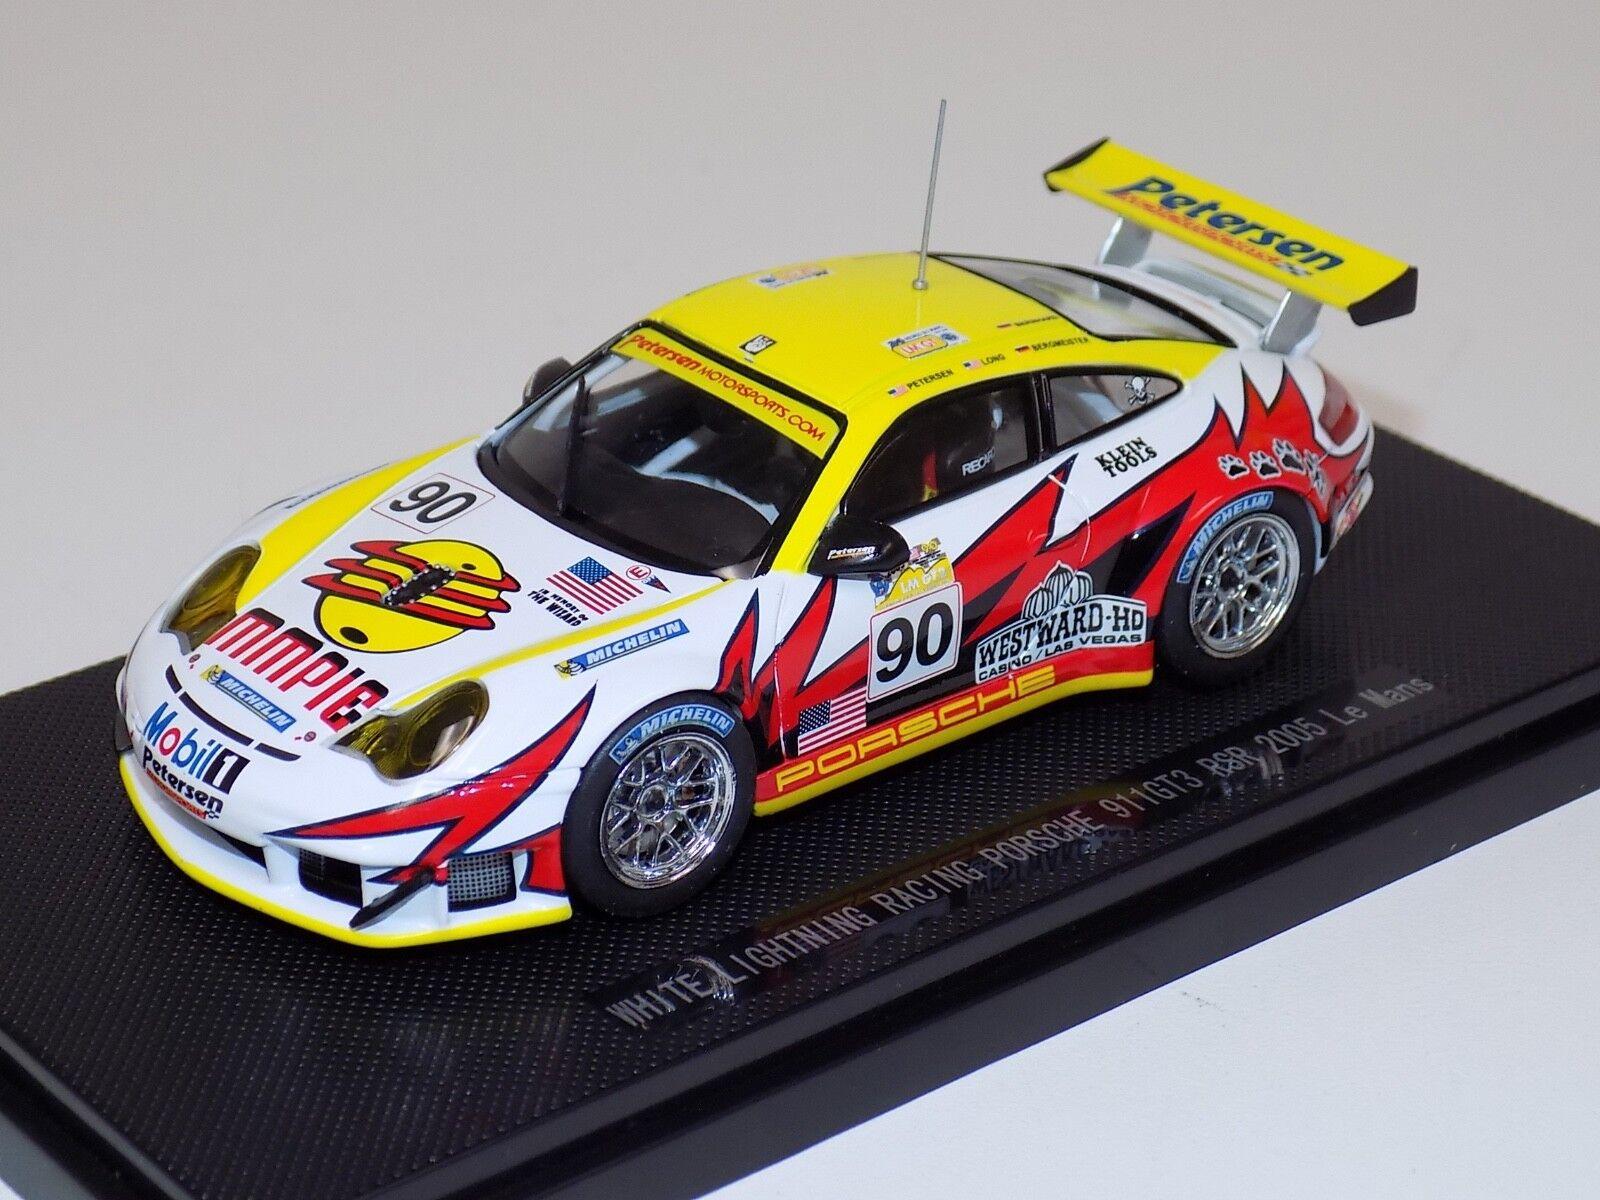 Ebbro Porsche 911 GT3 RSR   24 Hours of LeMans 2005   777